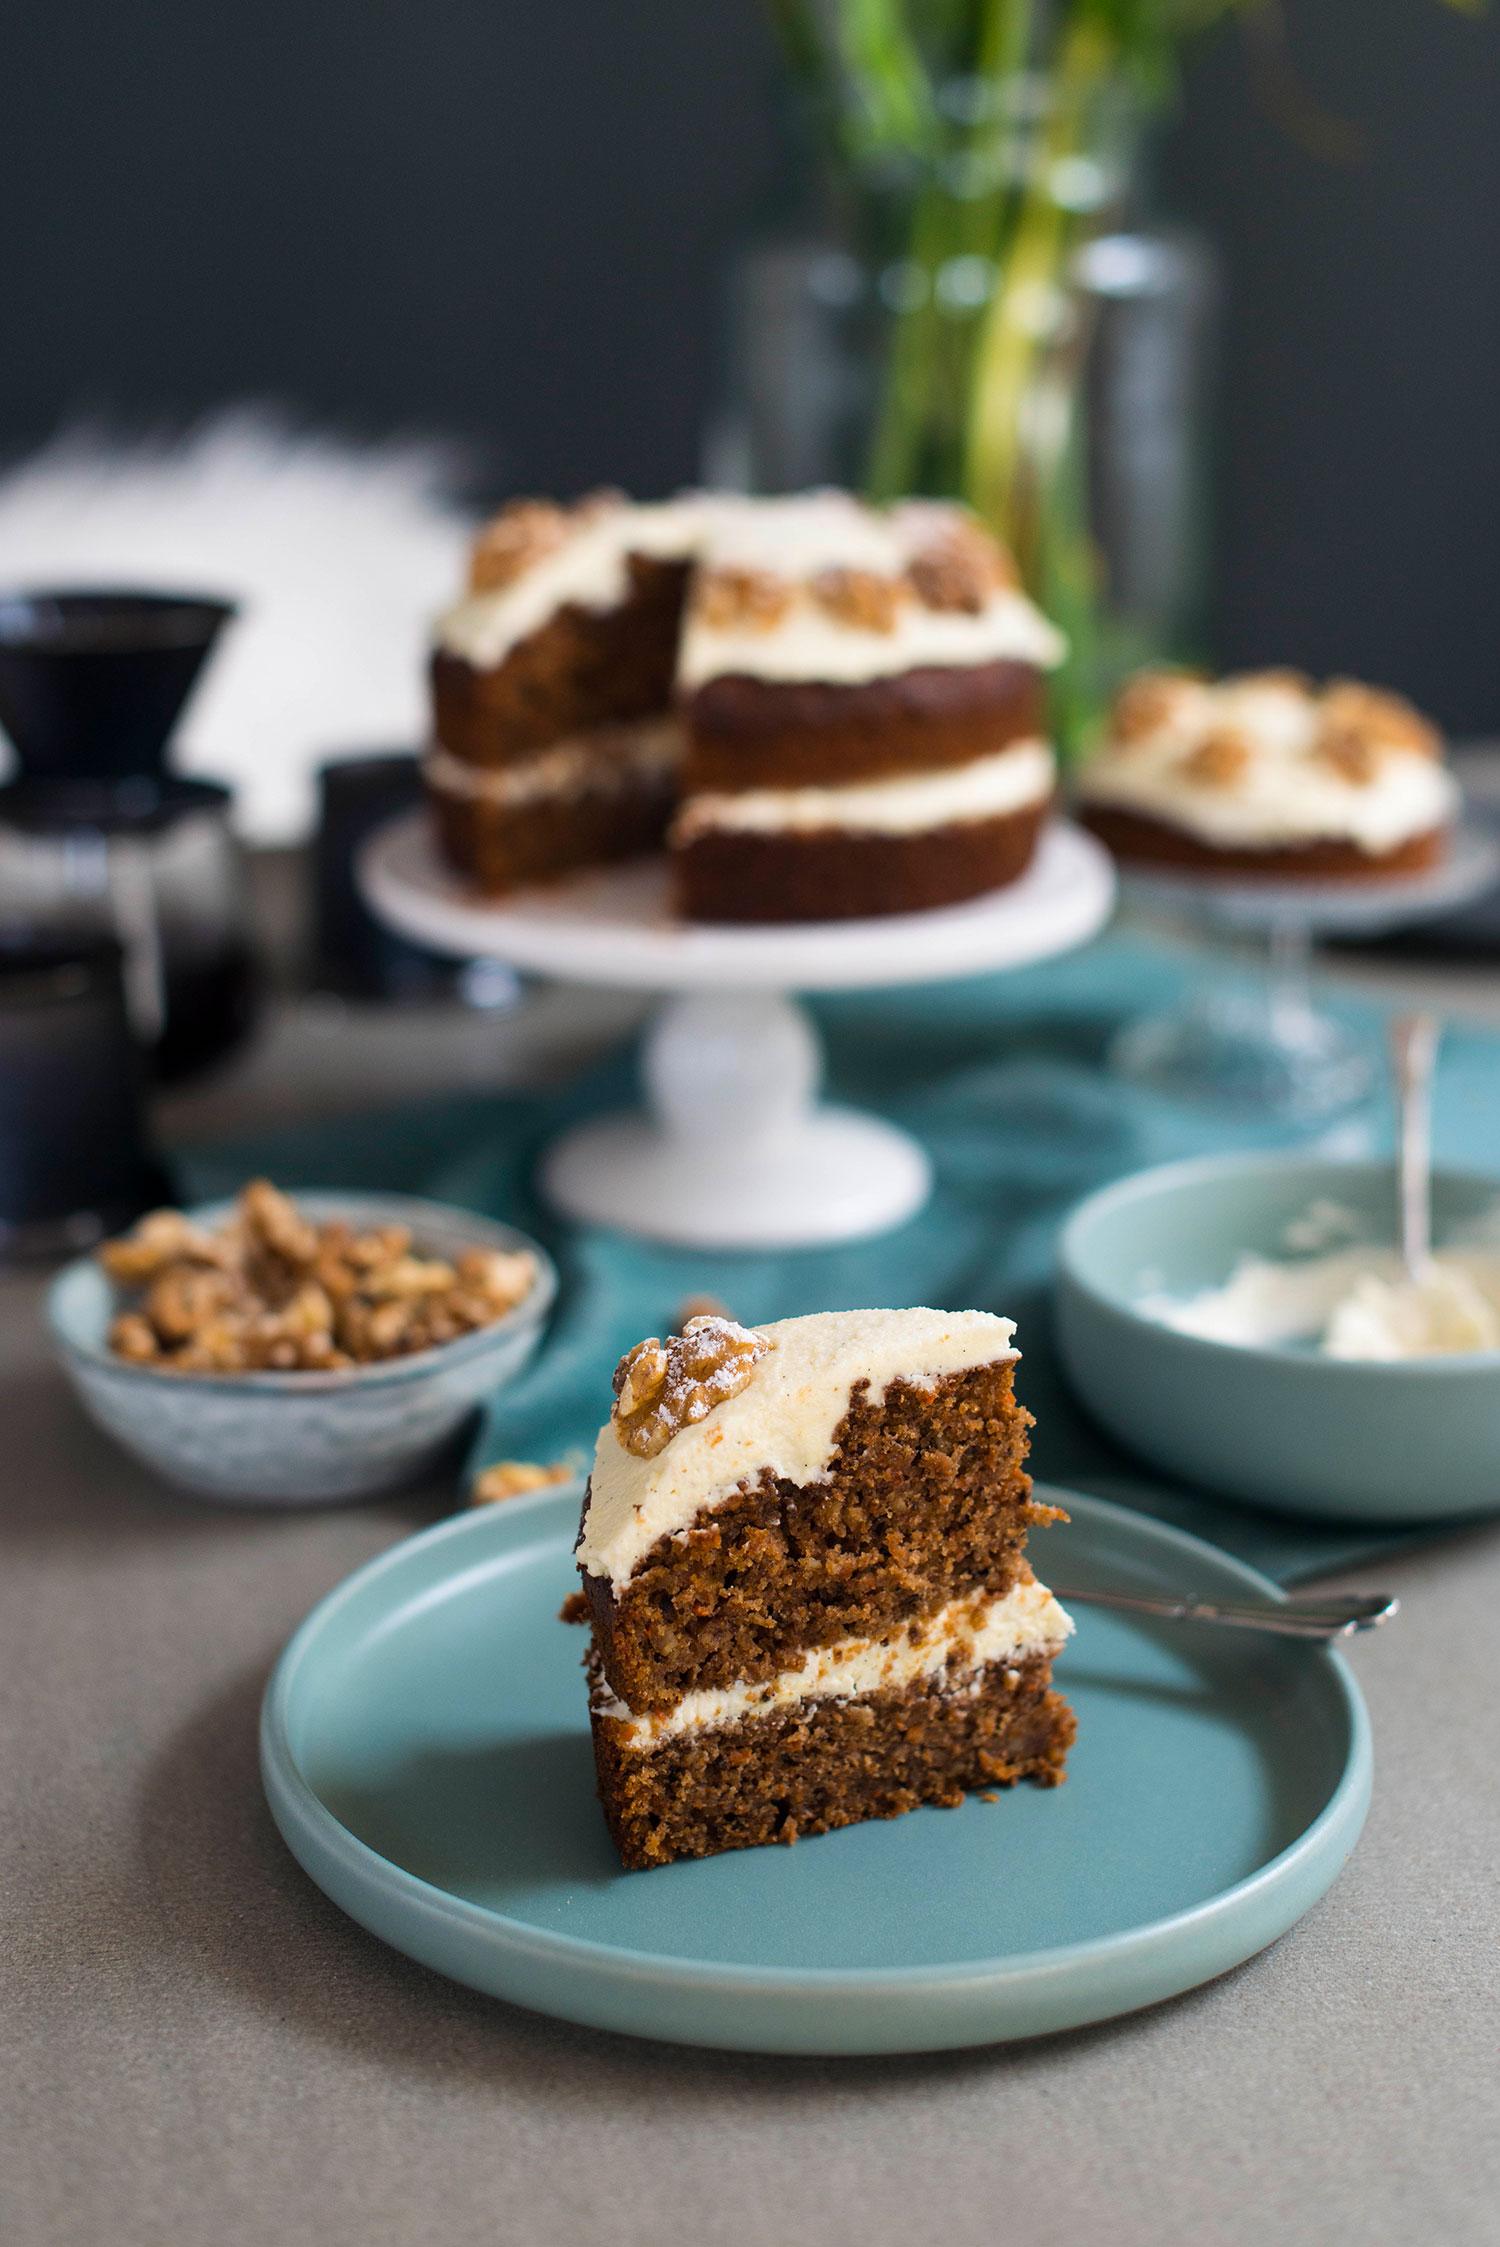 Carrot-Cake-Frischkäse-Frosting-3